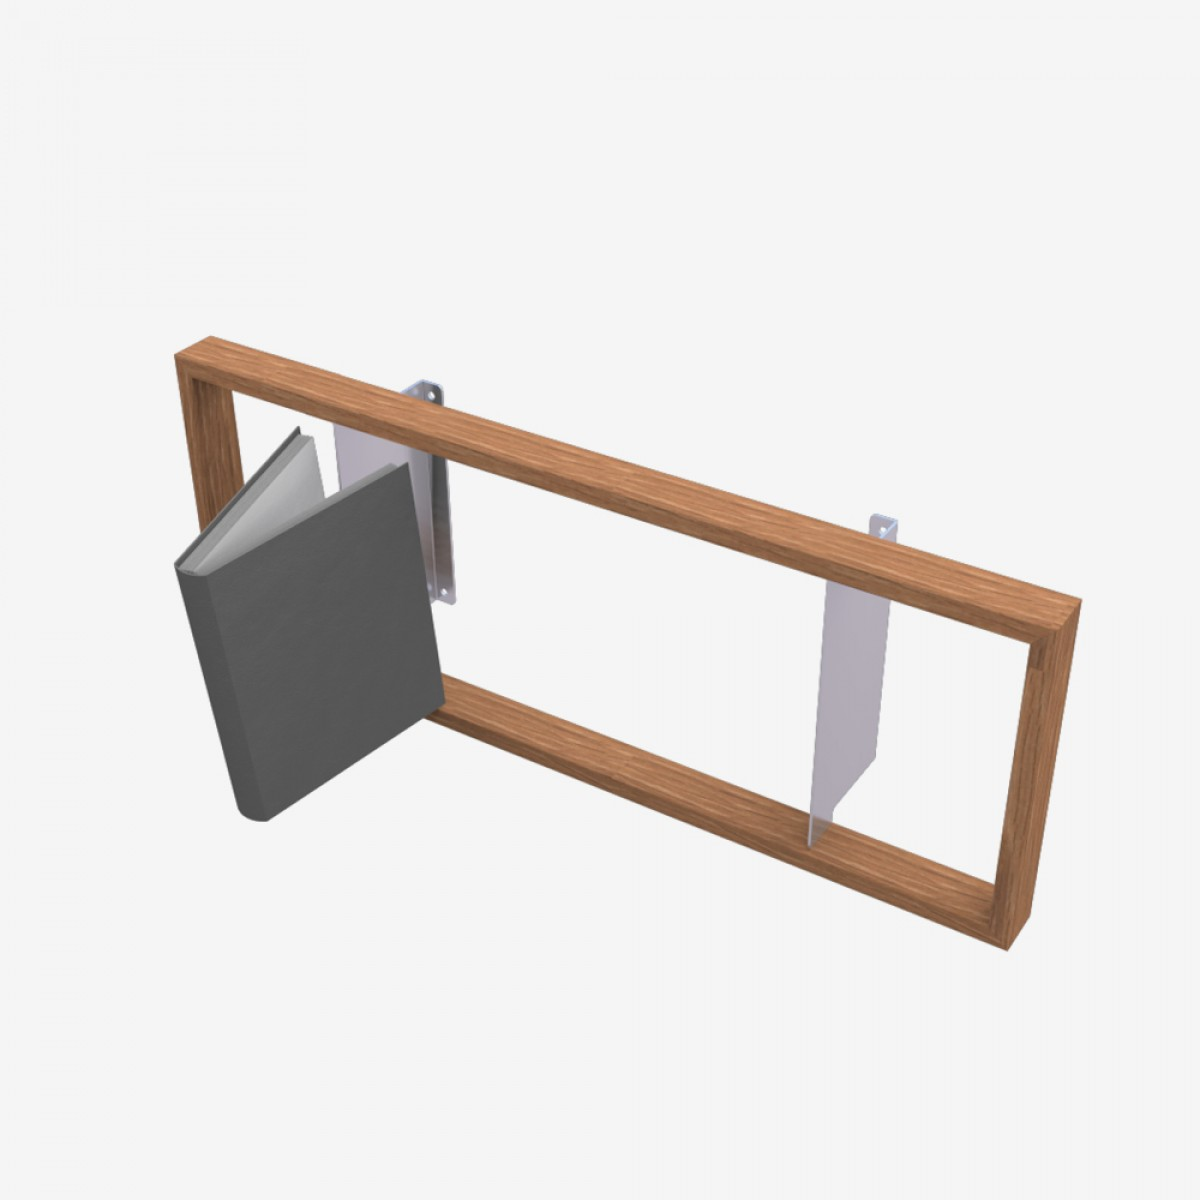 das kleine b regal b. Black Bedroom Furniture Sets. Home Design Ideas